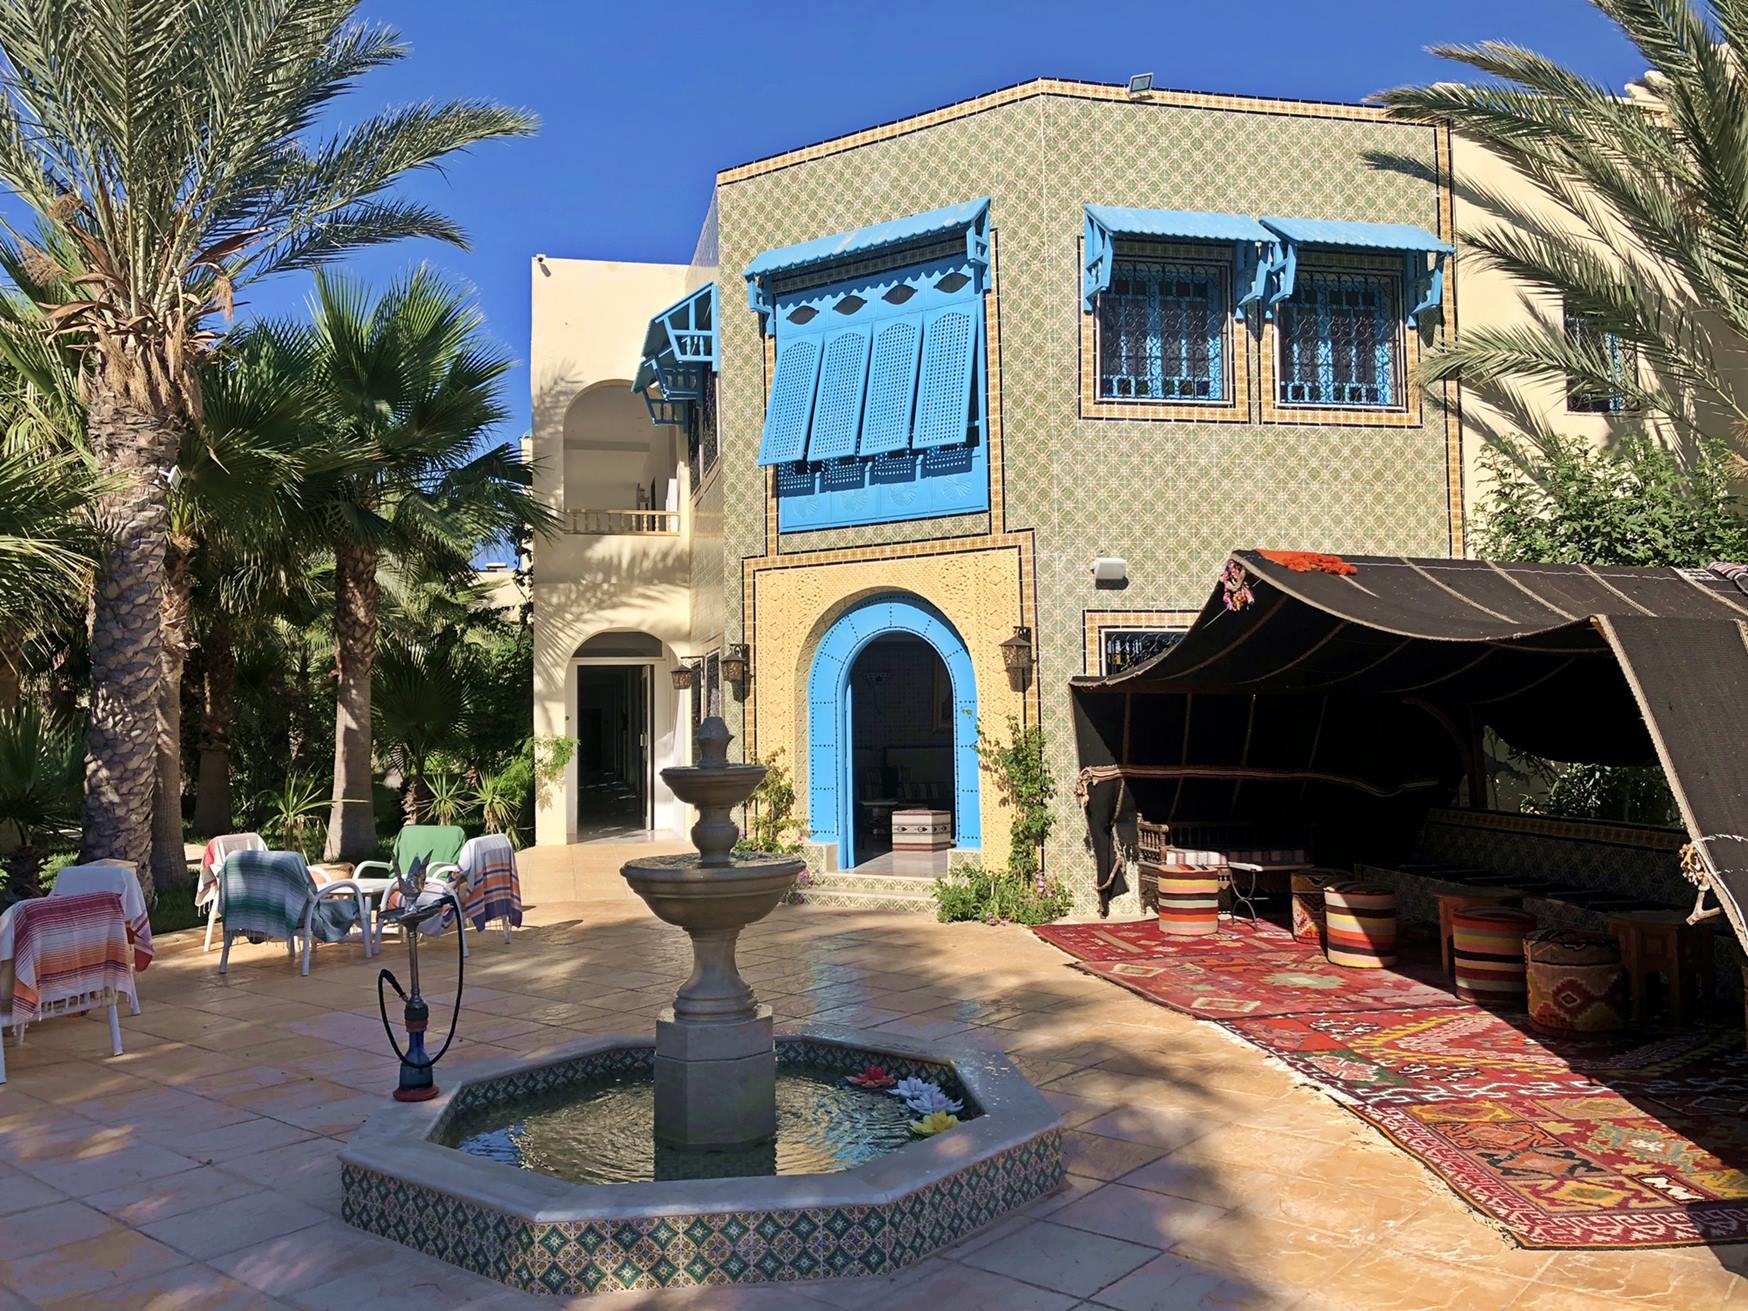 djerba_tunisia_ksarhotel_1